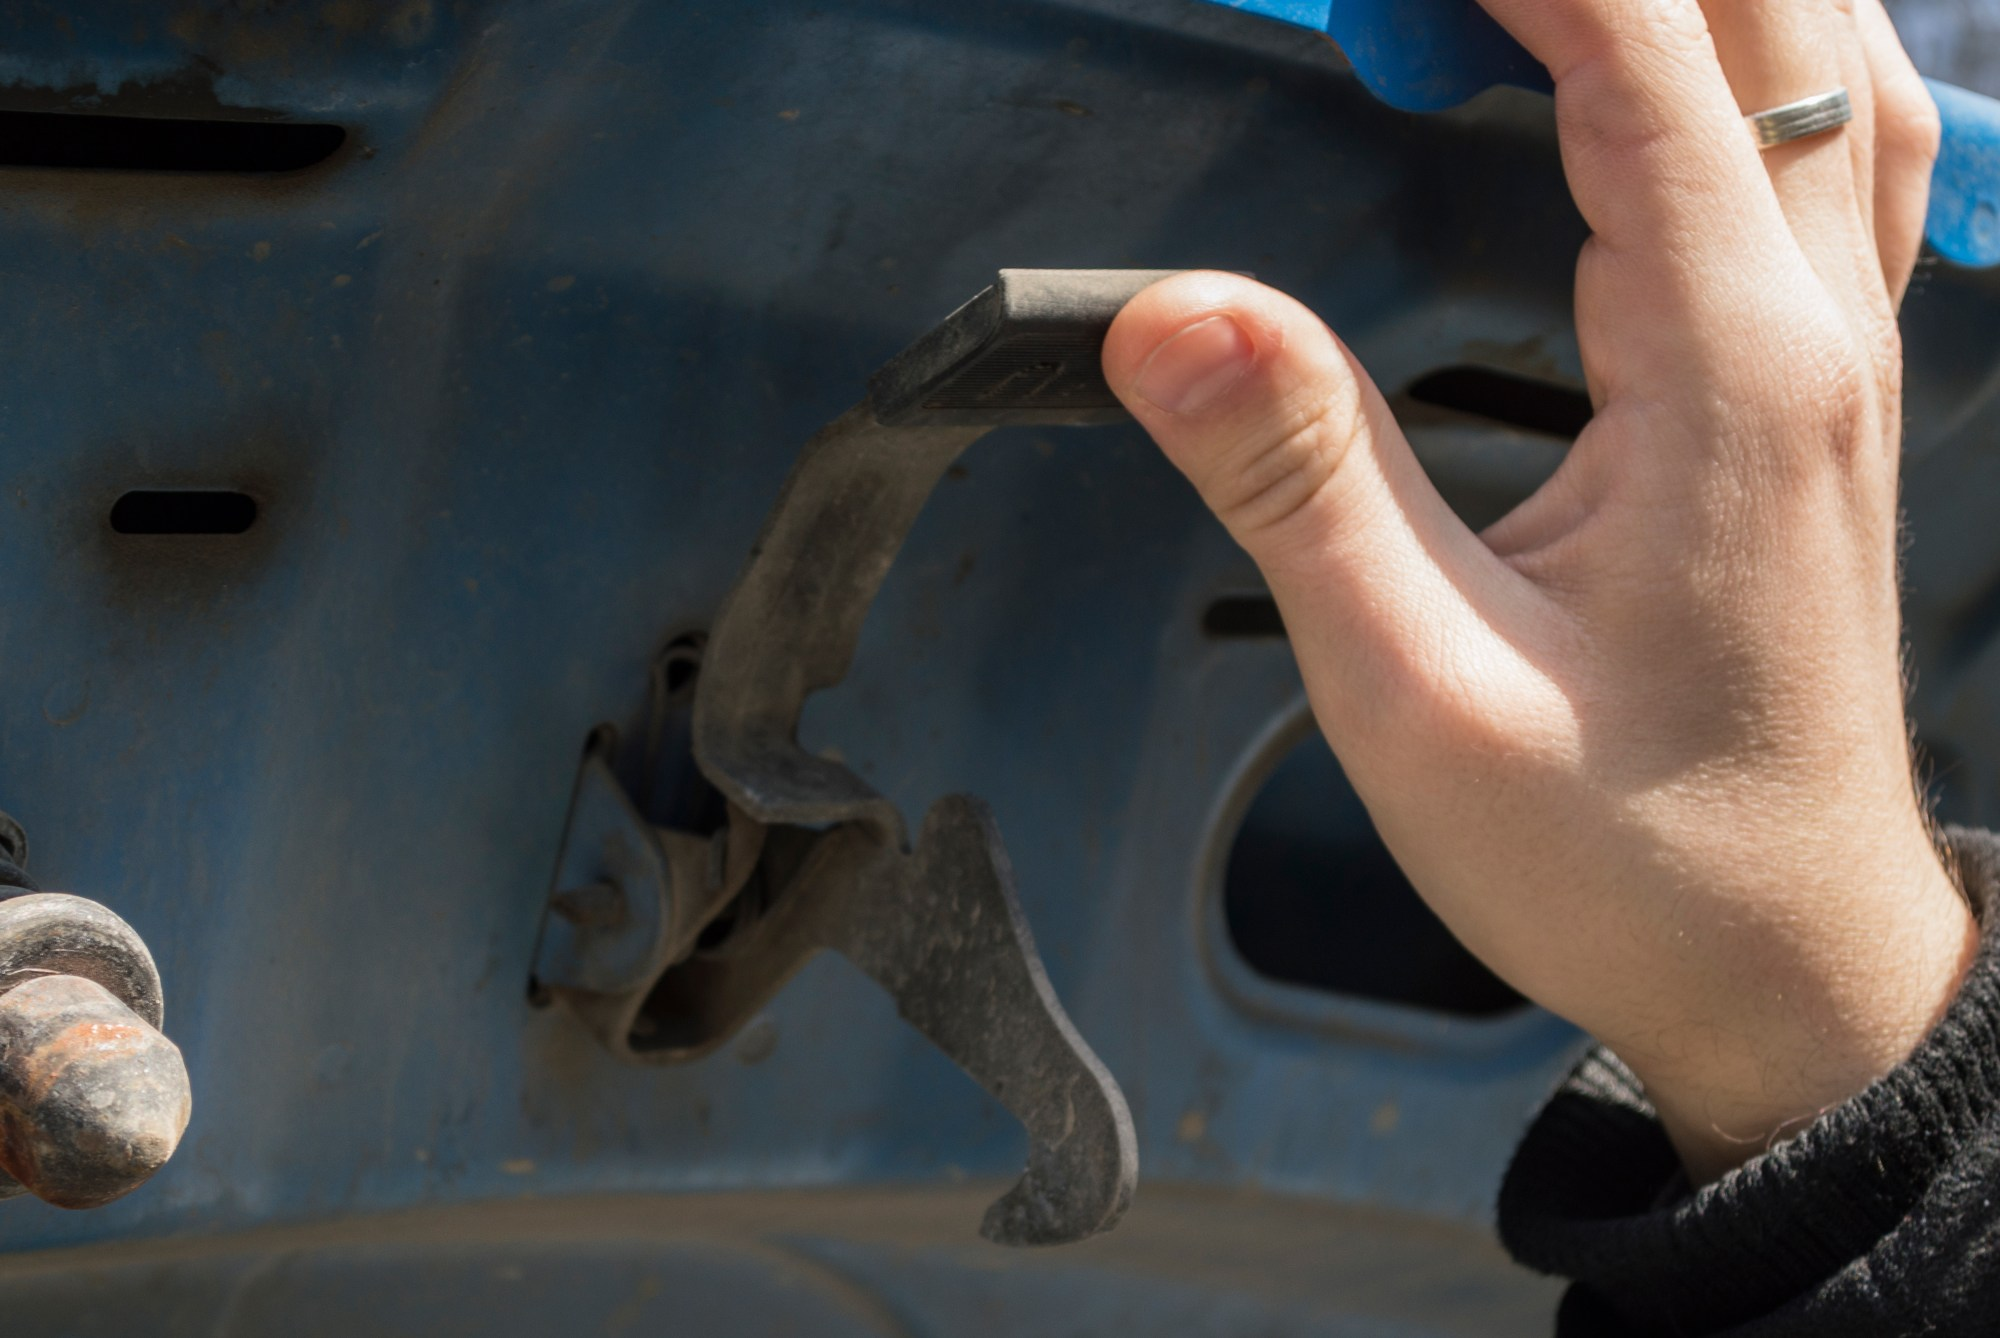 hight resolution of 1997 chevy blazer rear hatch lock will not open back diagram